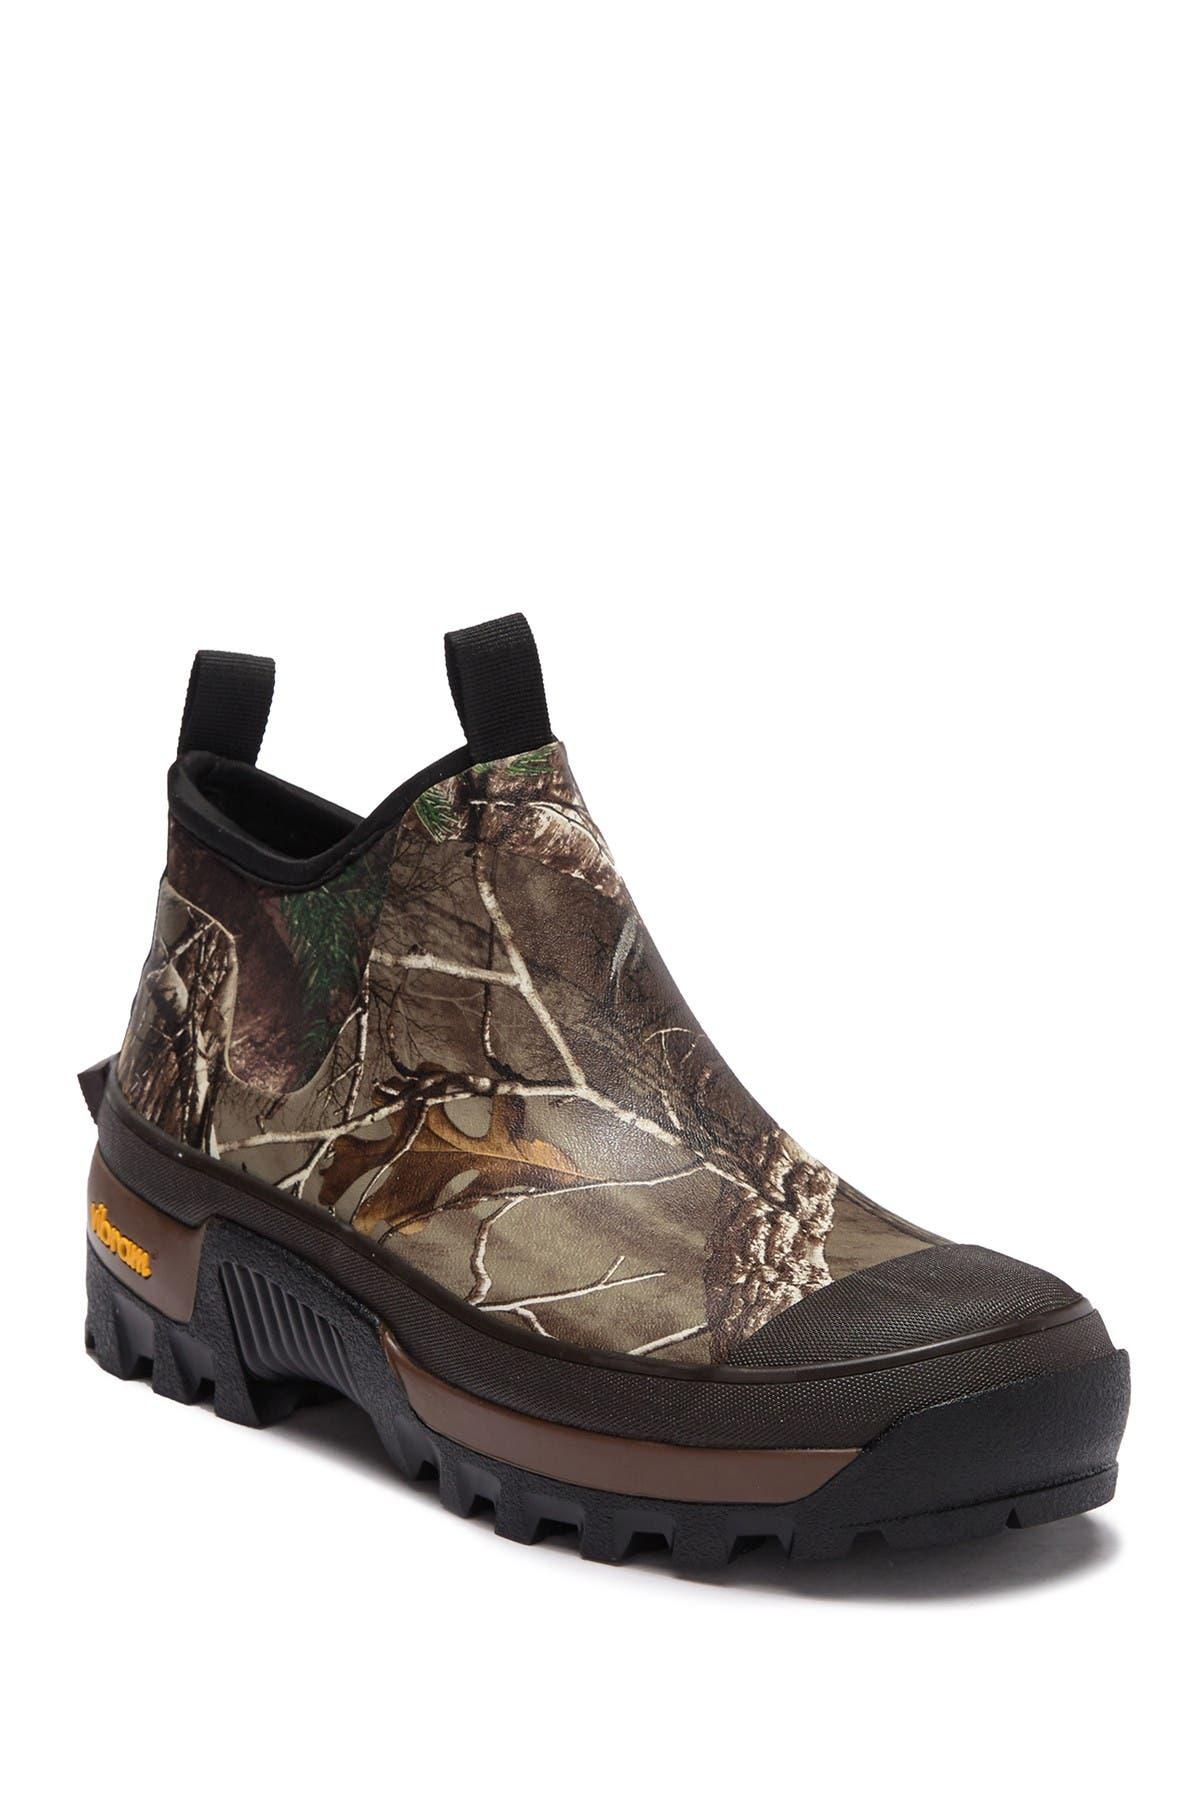 Realtree Ankle Waterproof Shoe